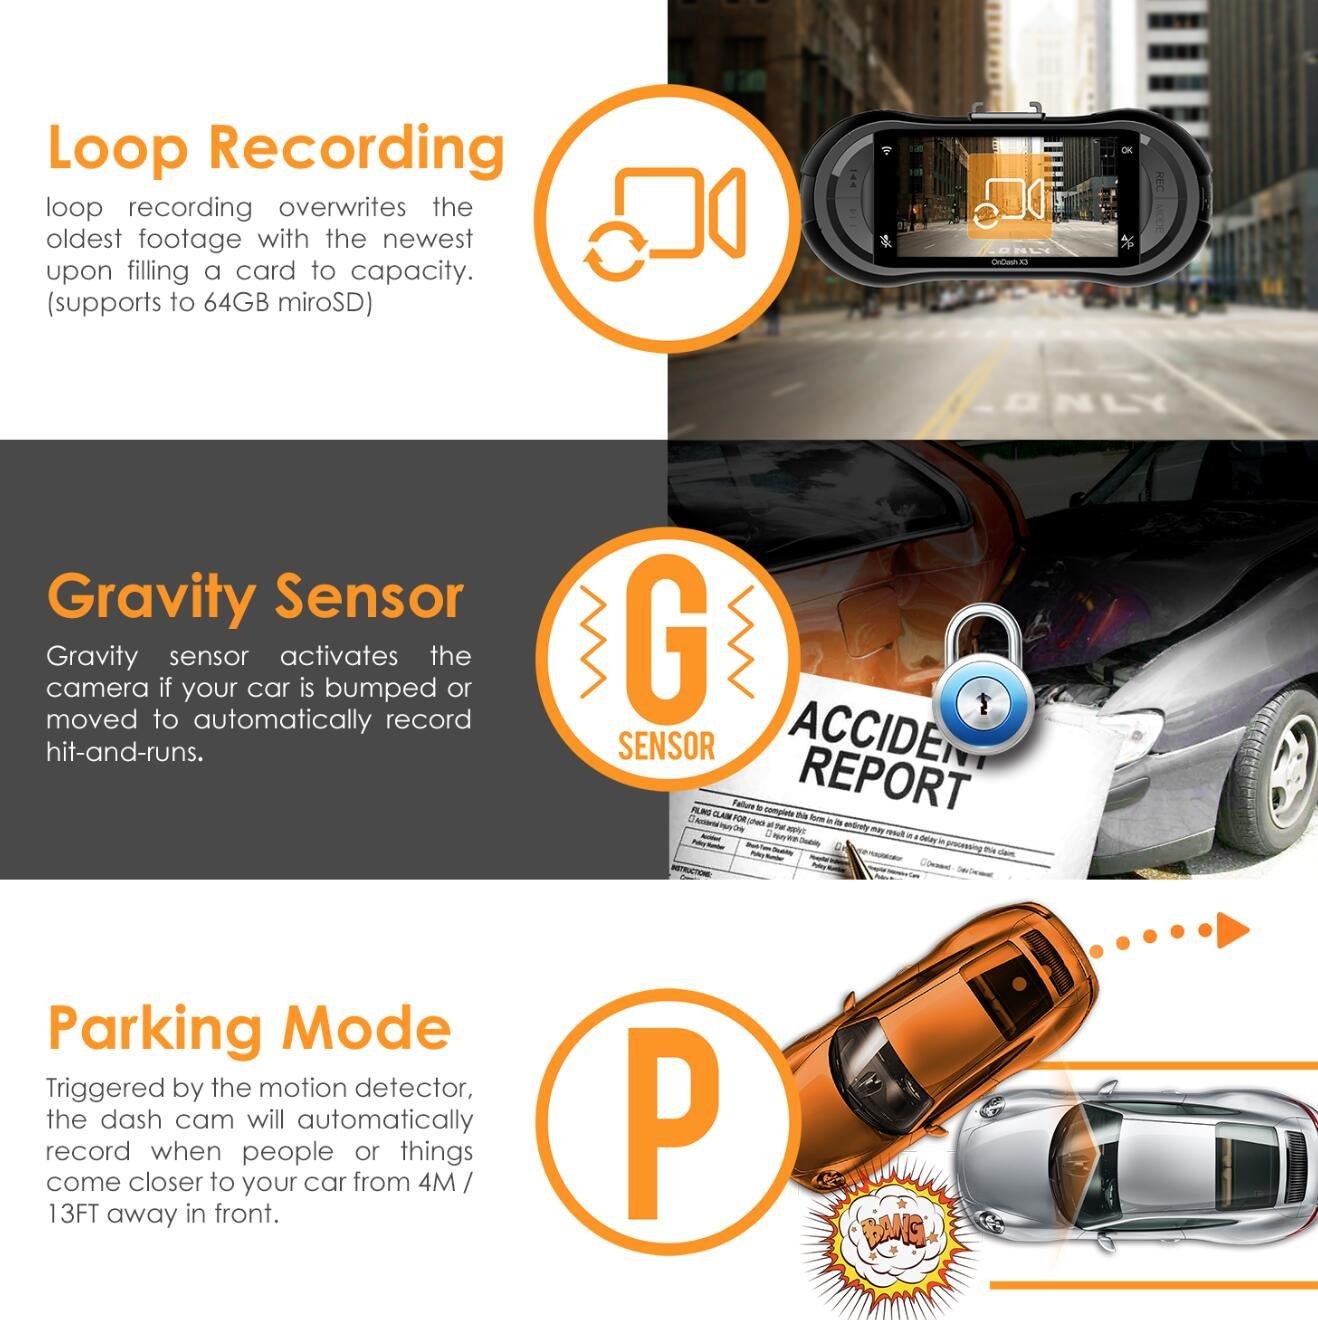 Vantrue X3 WIFI Dash Cam, Super HD 2.5K Car Dashboard Camera 1440P Car Camera with Ambarella A12 Chipset, 170°Wide Angle, Super HDR Night Vision, Loop Recording, Parking Mode, Motion Detection by VANTRUE (Image #6)